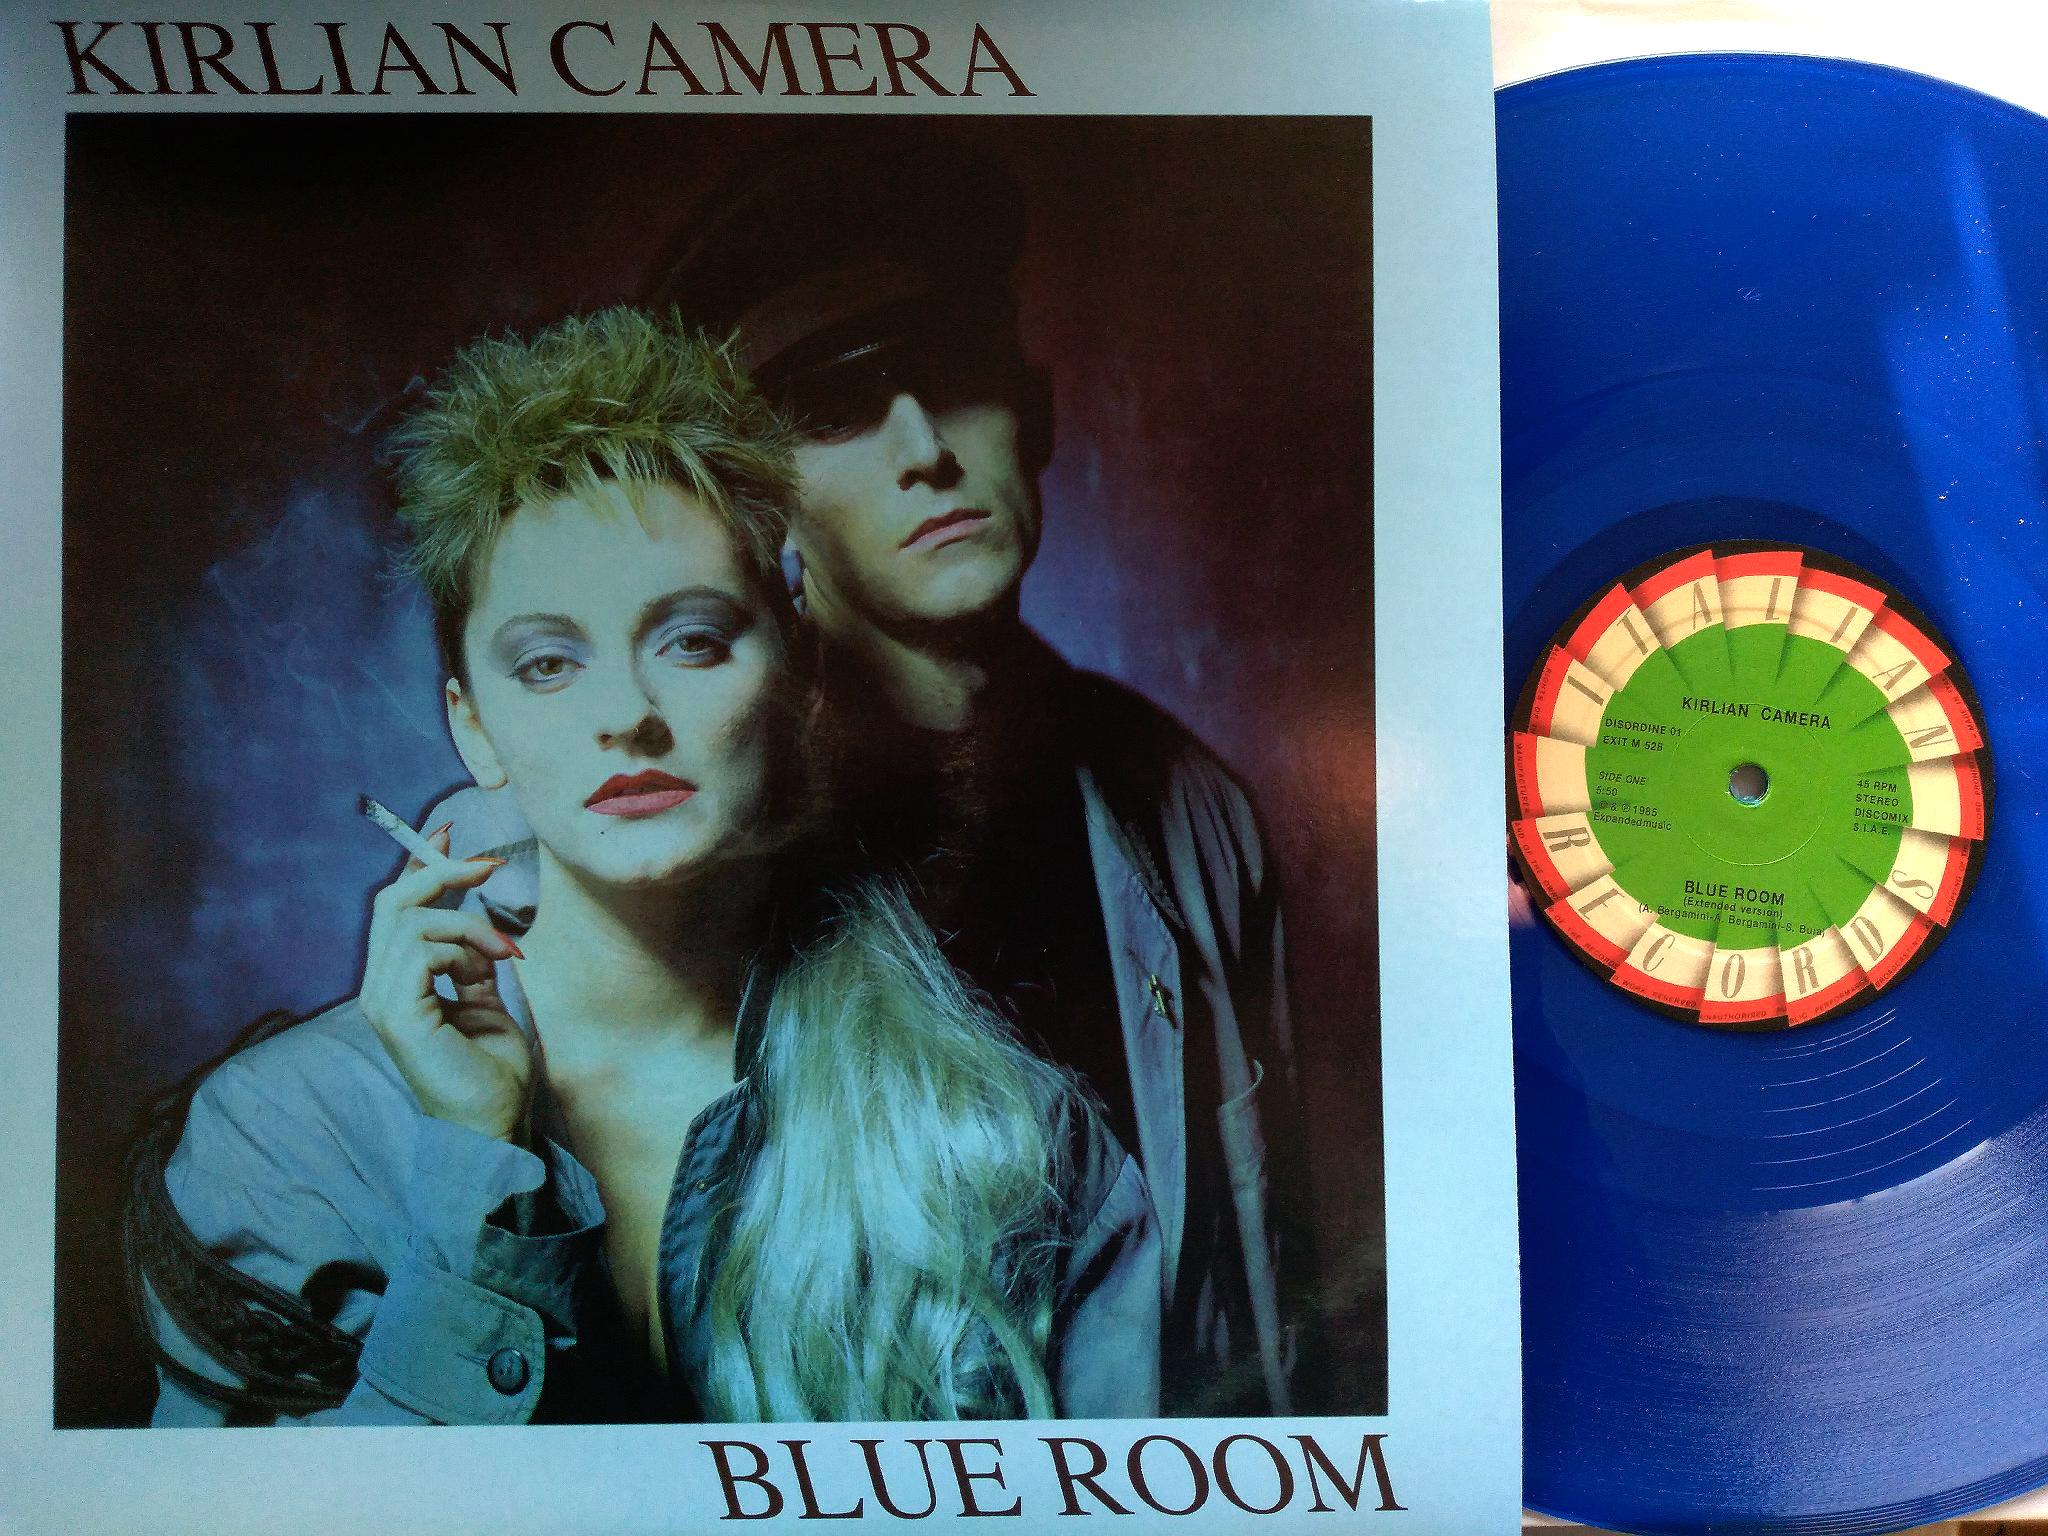 Kirlian Camera - Blue Room